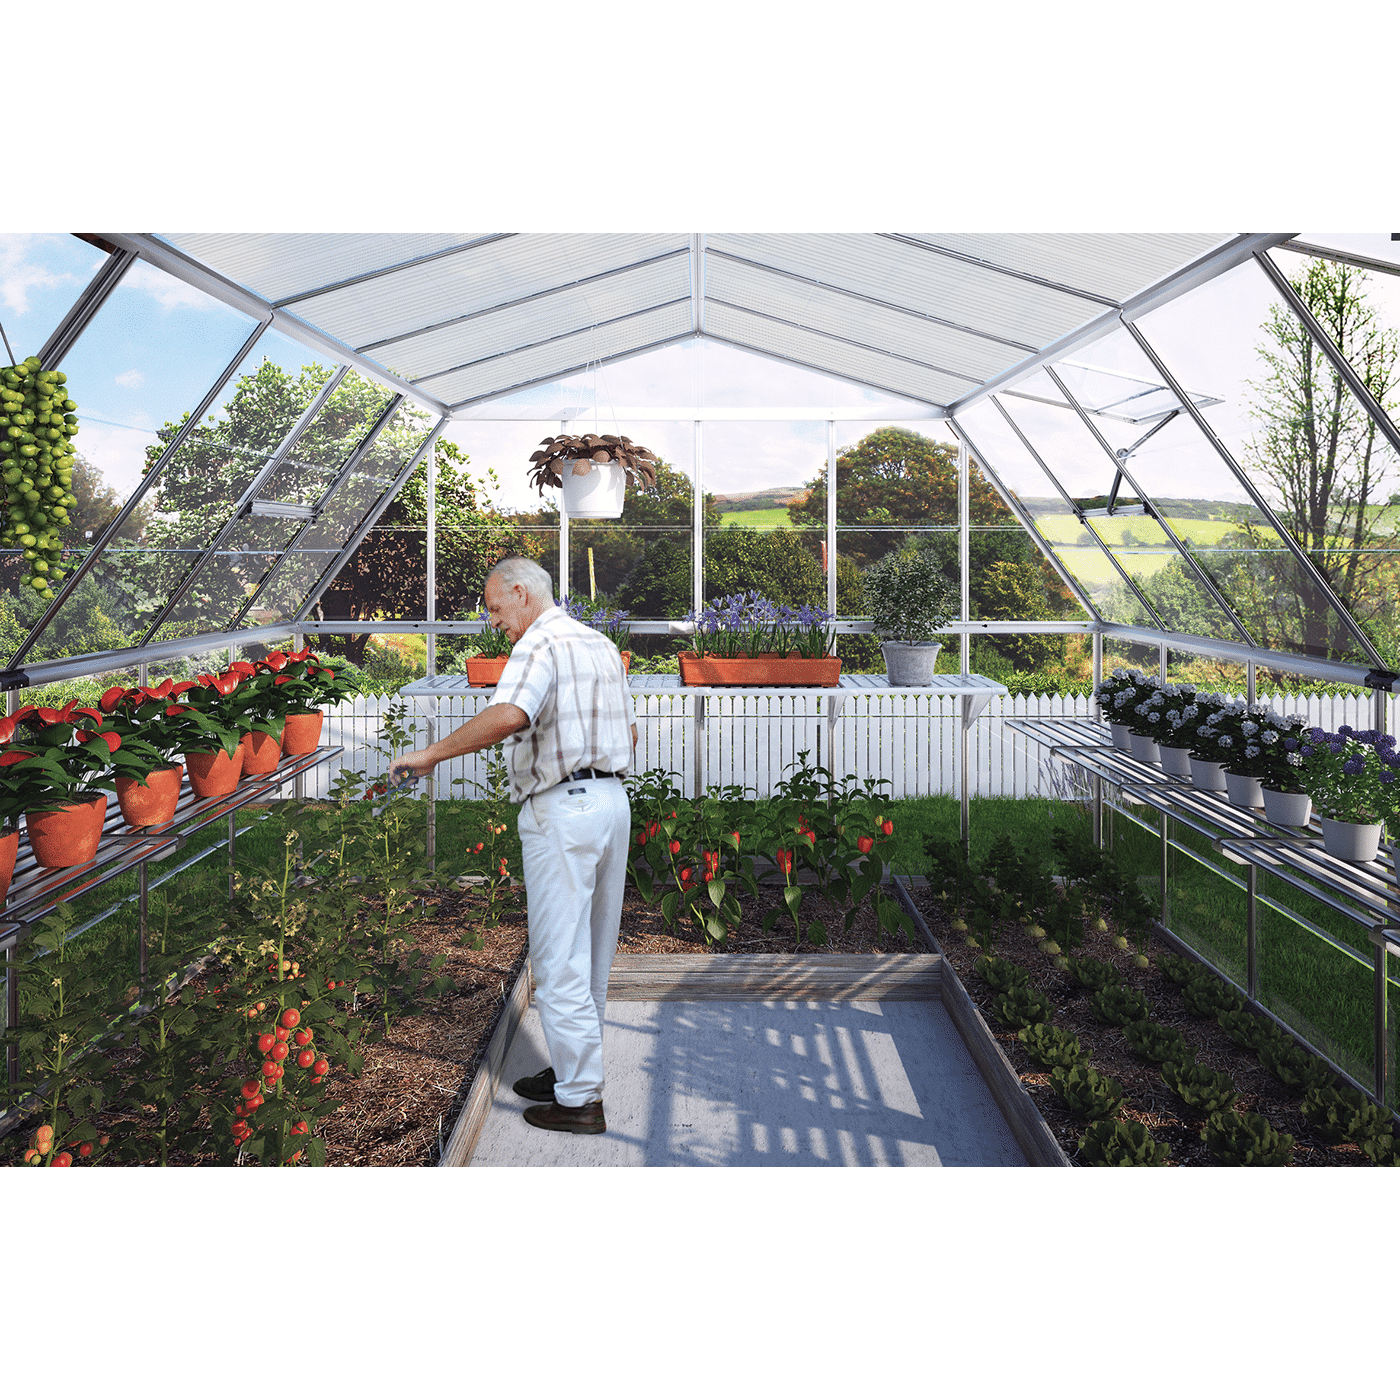 Americana Greenhouse 12x12 365x365cm 187 Tip Top Yards